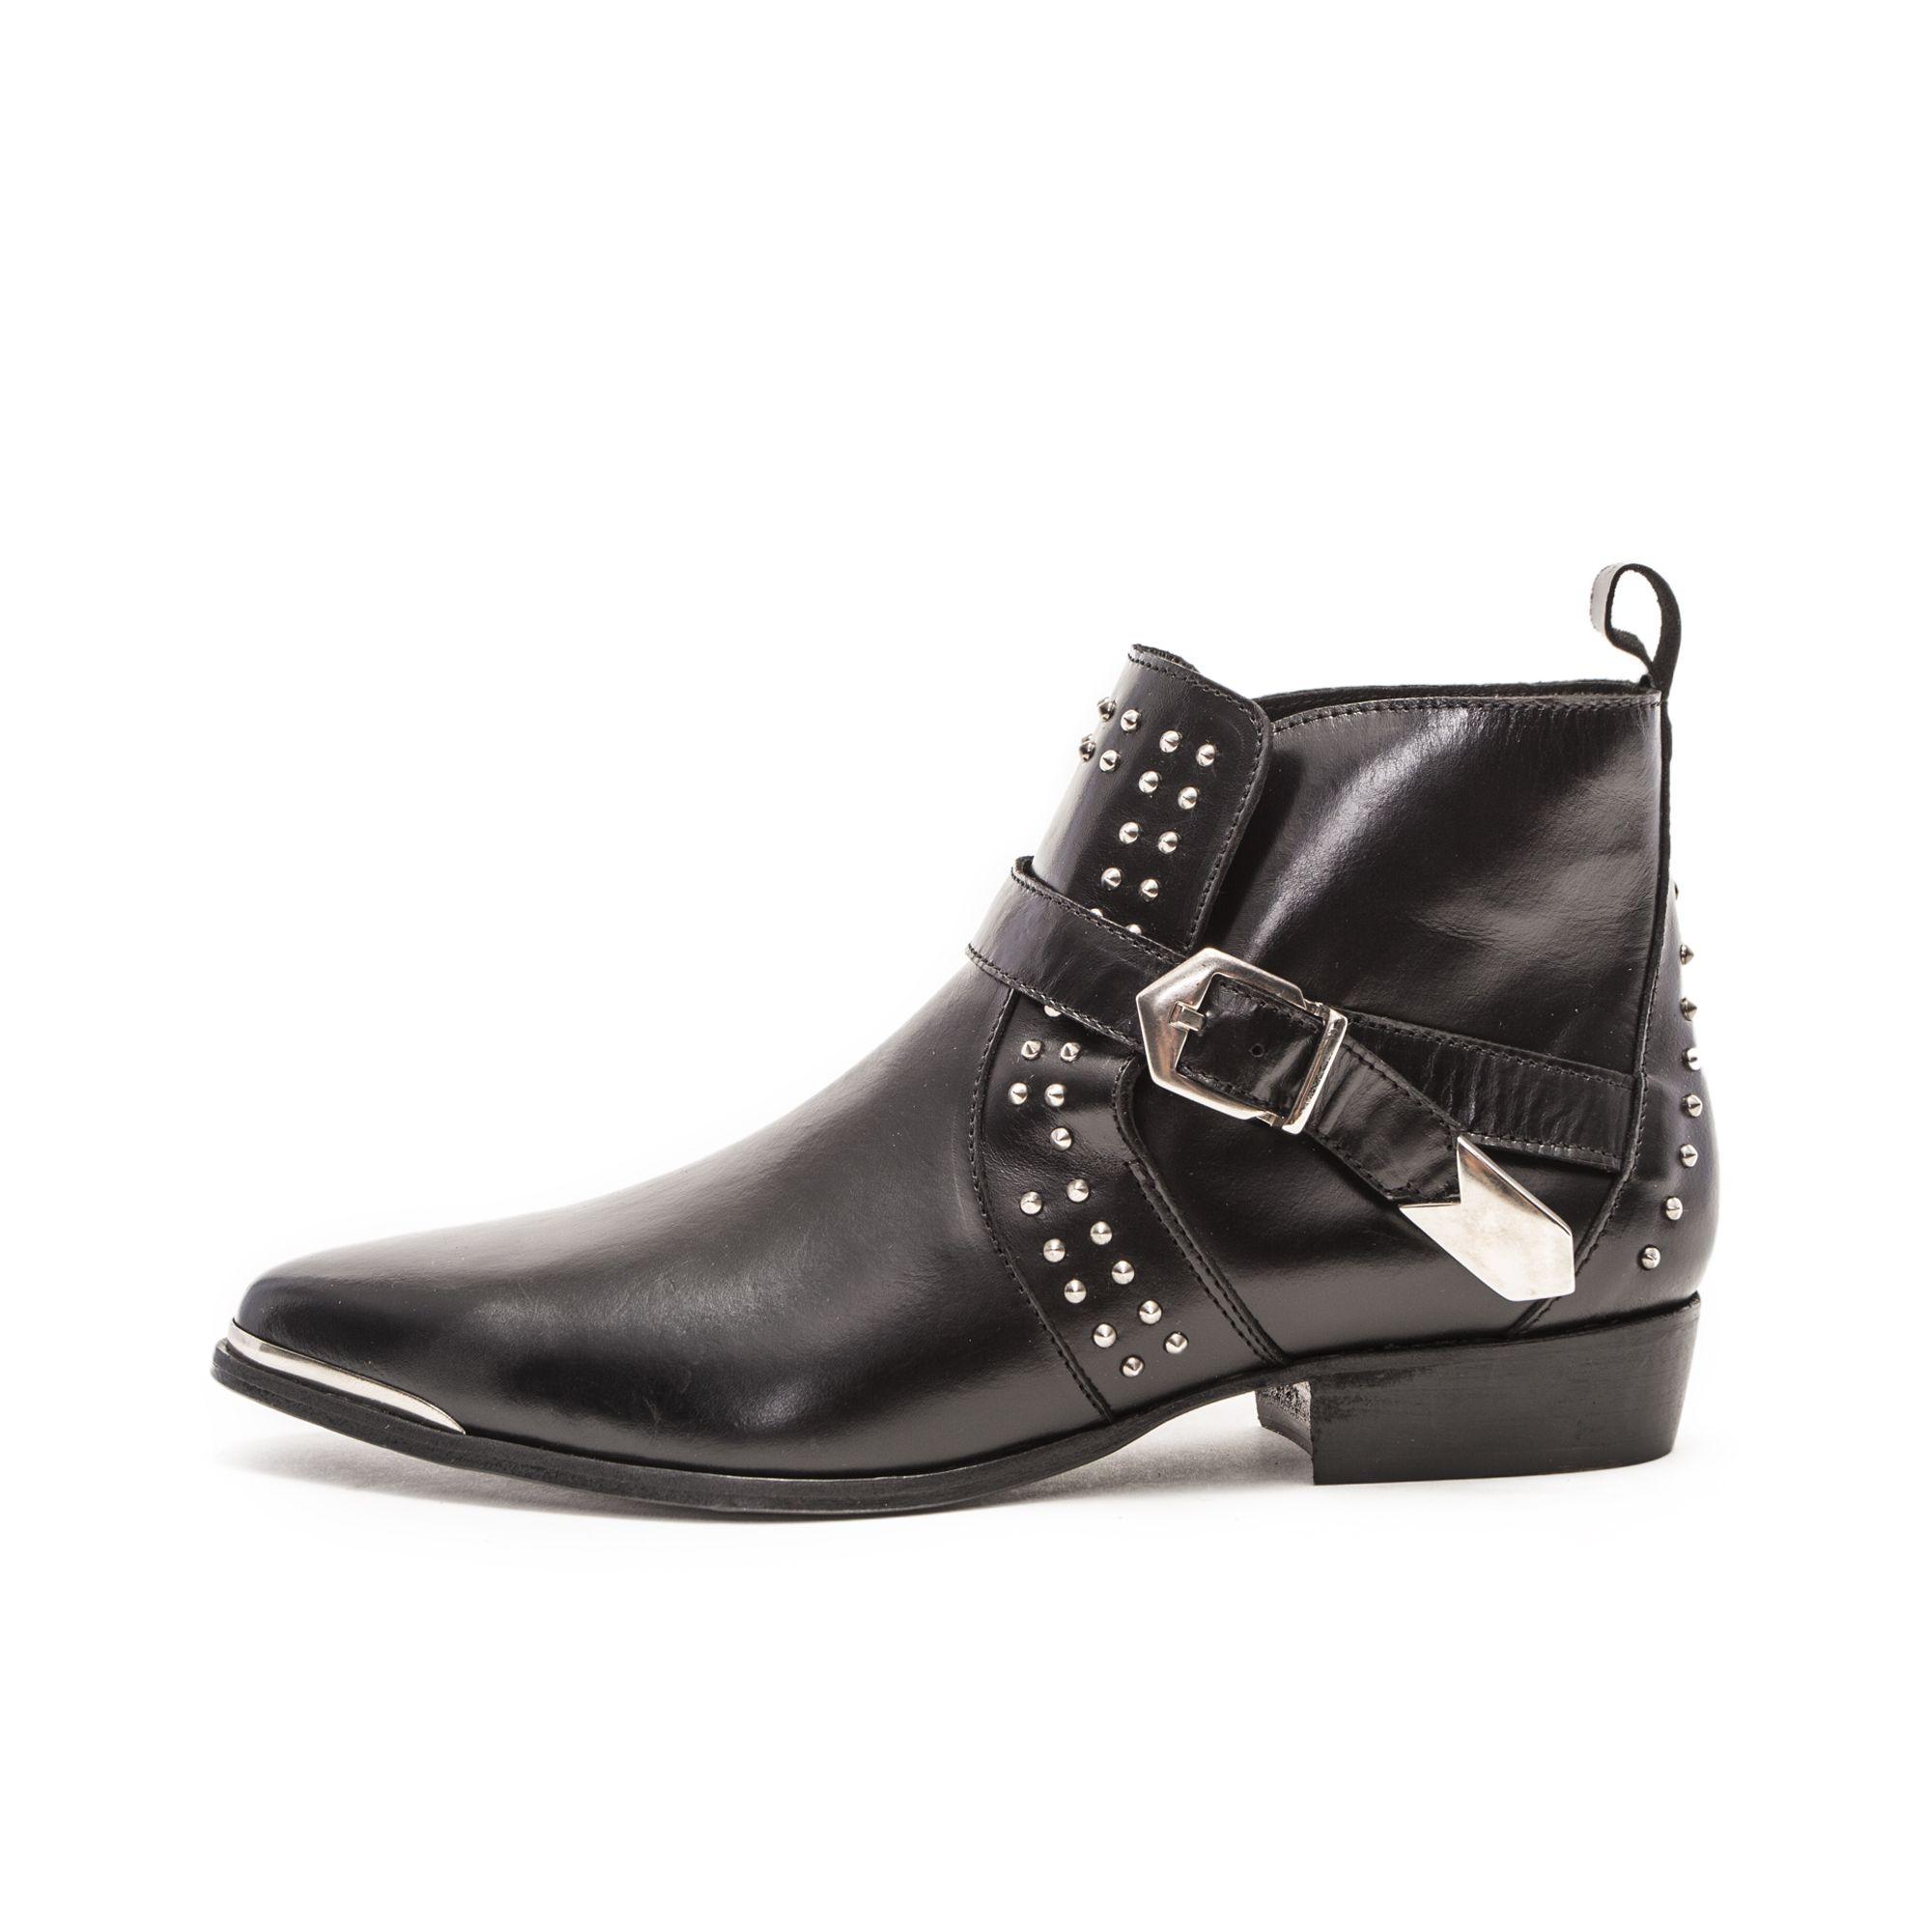 0fcdd91b12a Les chaussures IKKS - 225€